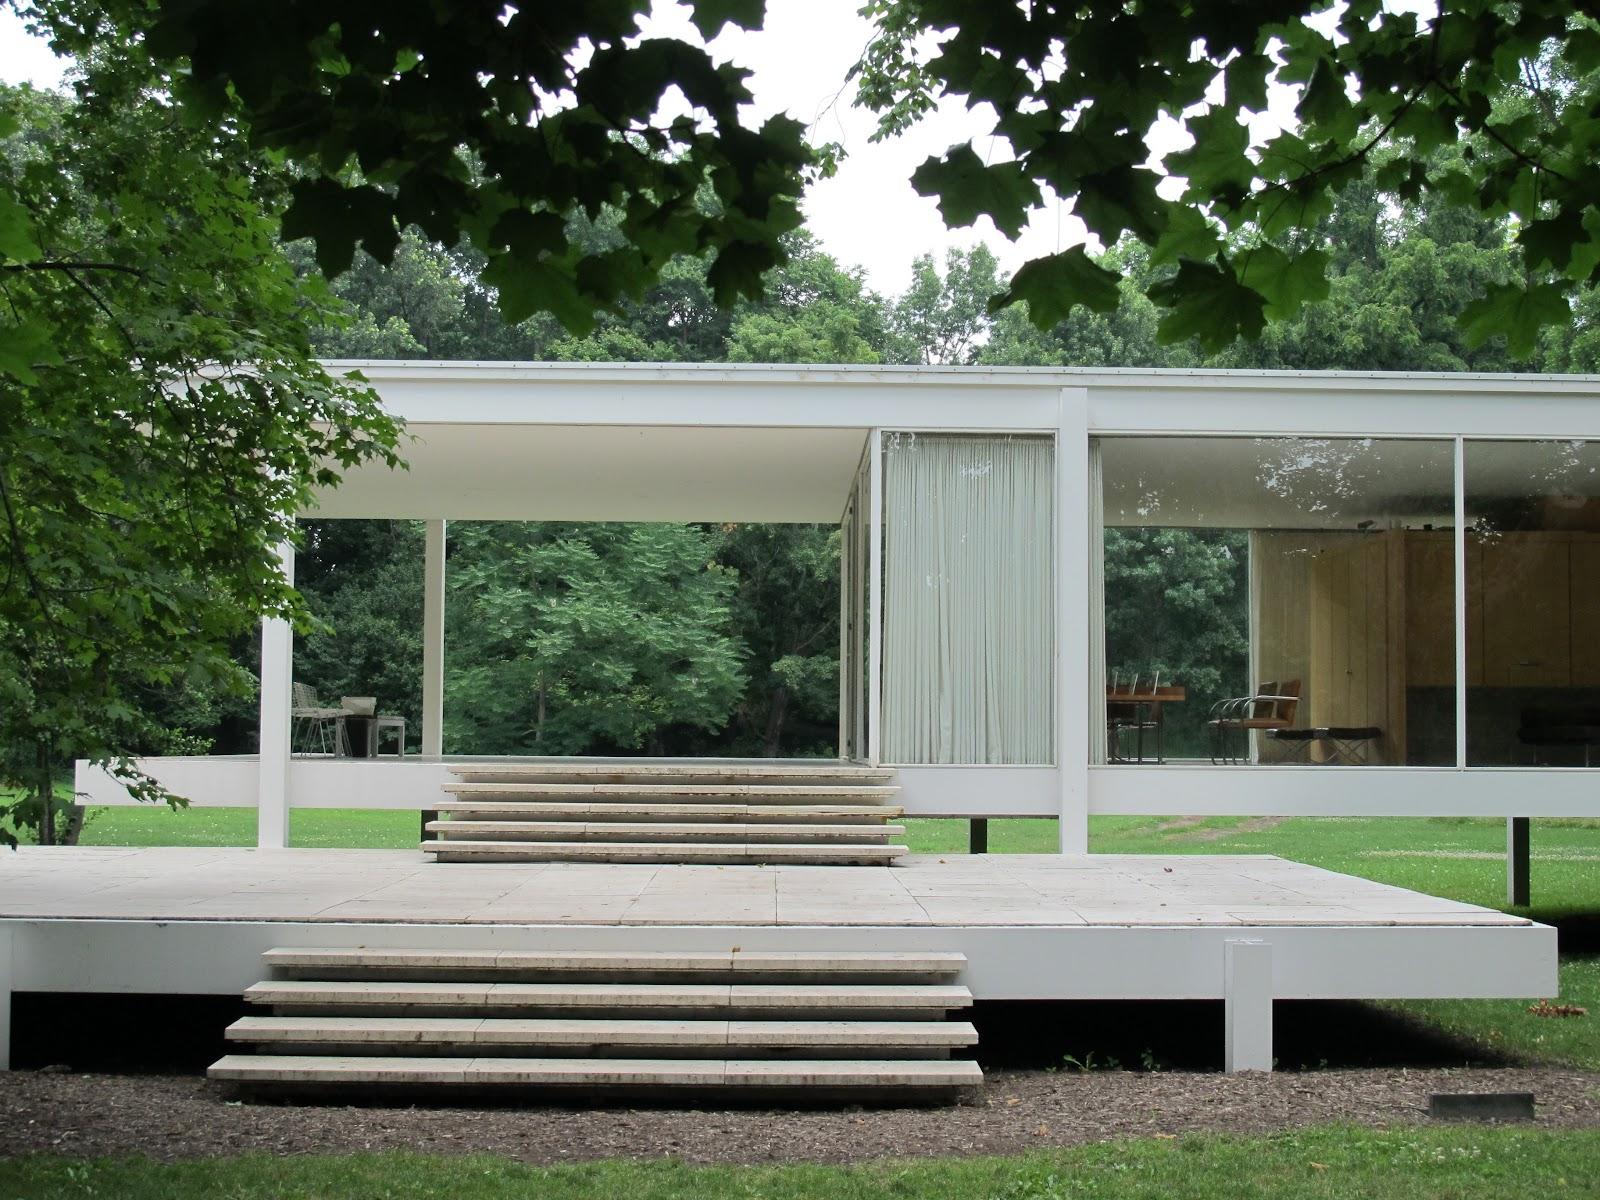 Farnsworth House with nature around